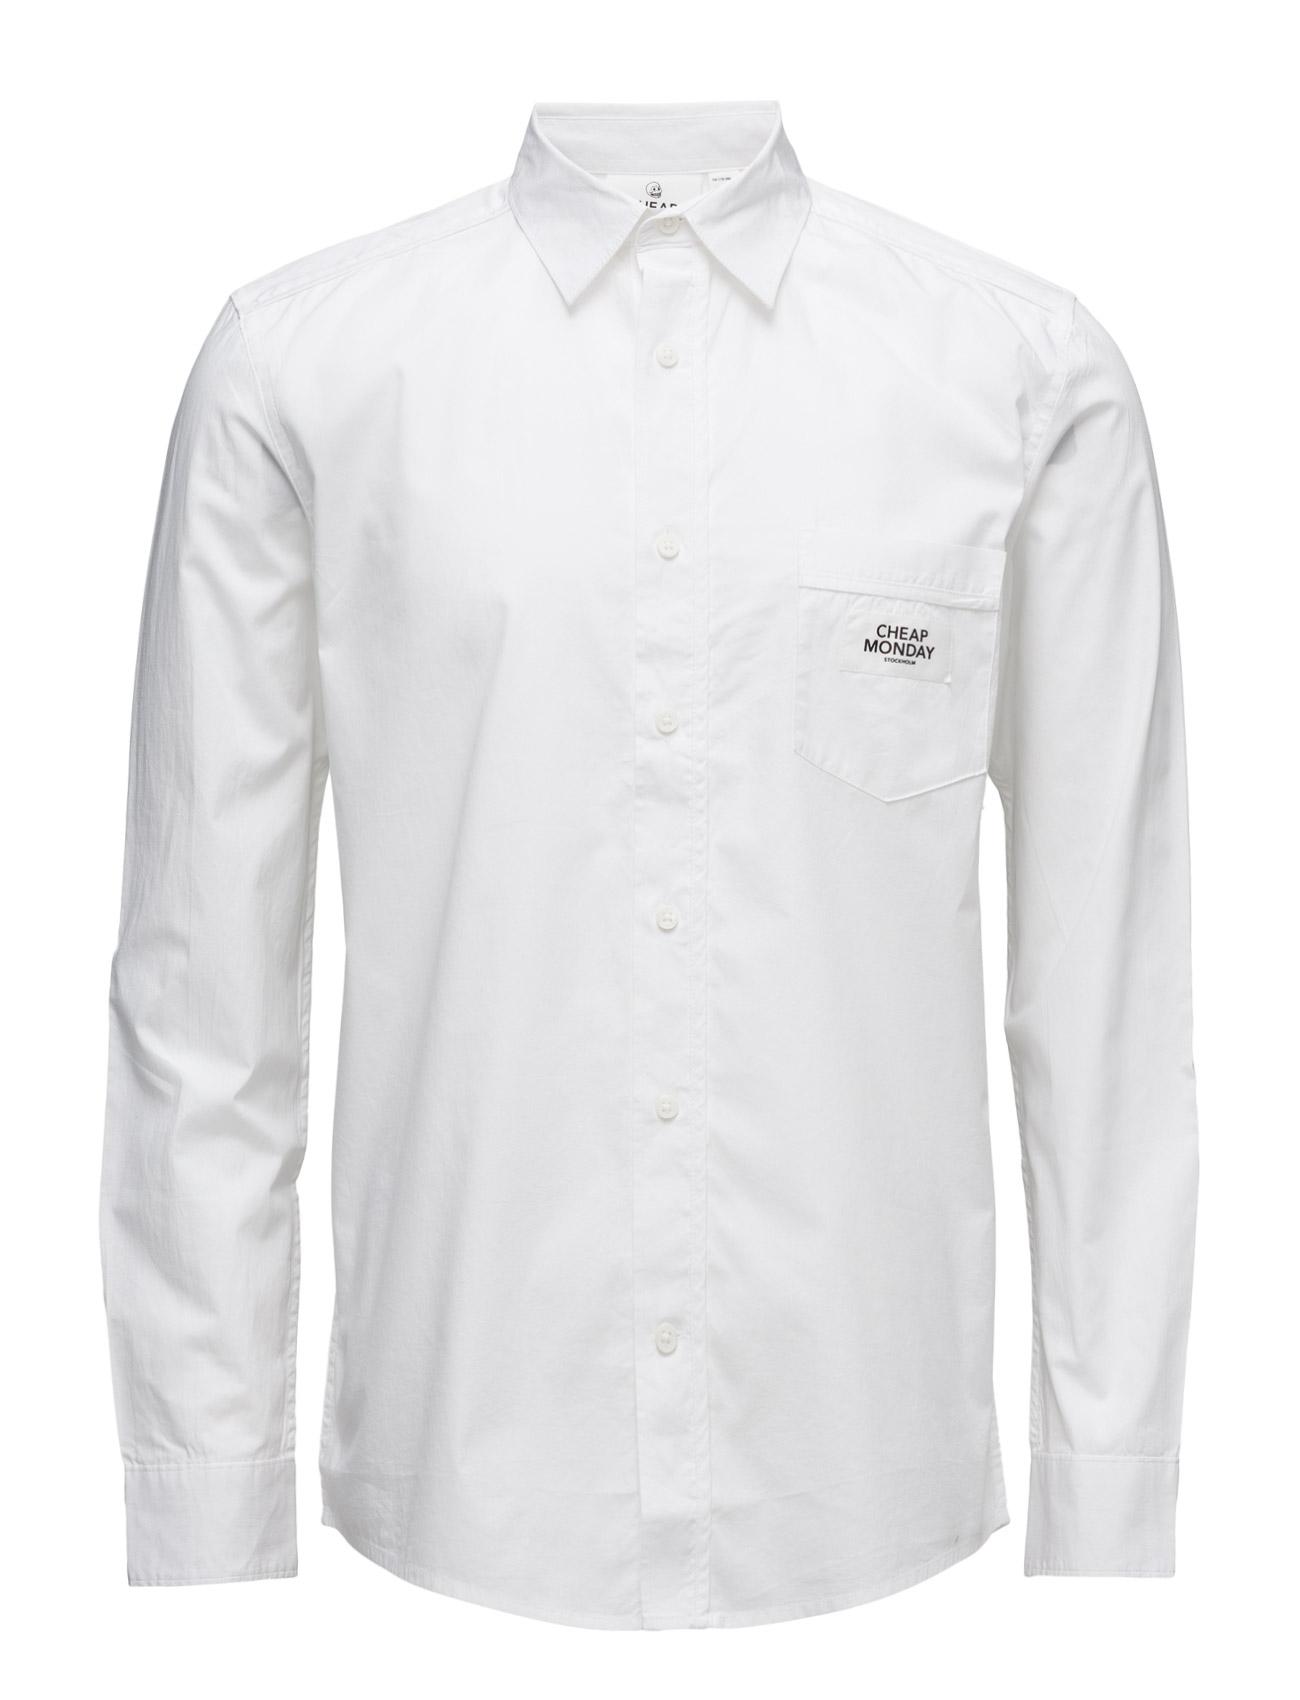 Avoid Shirt Cheap Monday Casual Skor